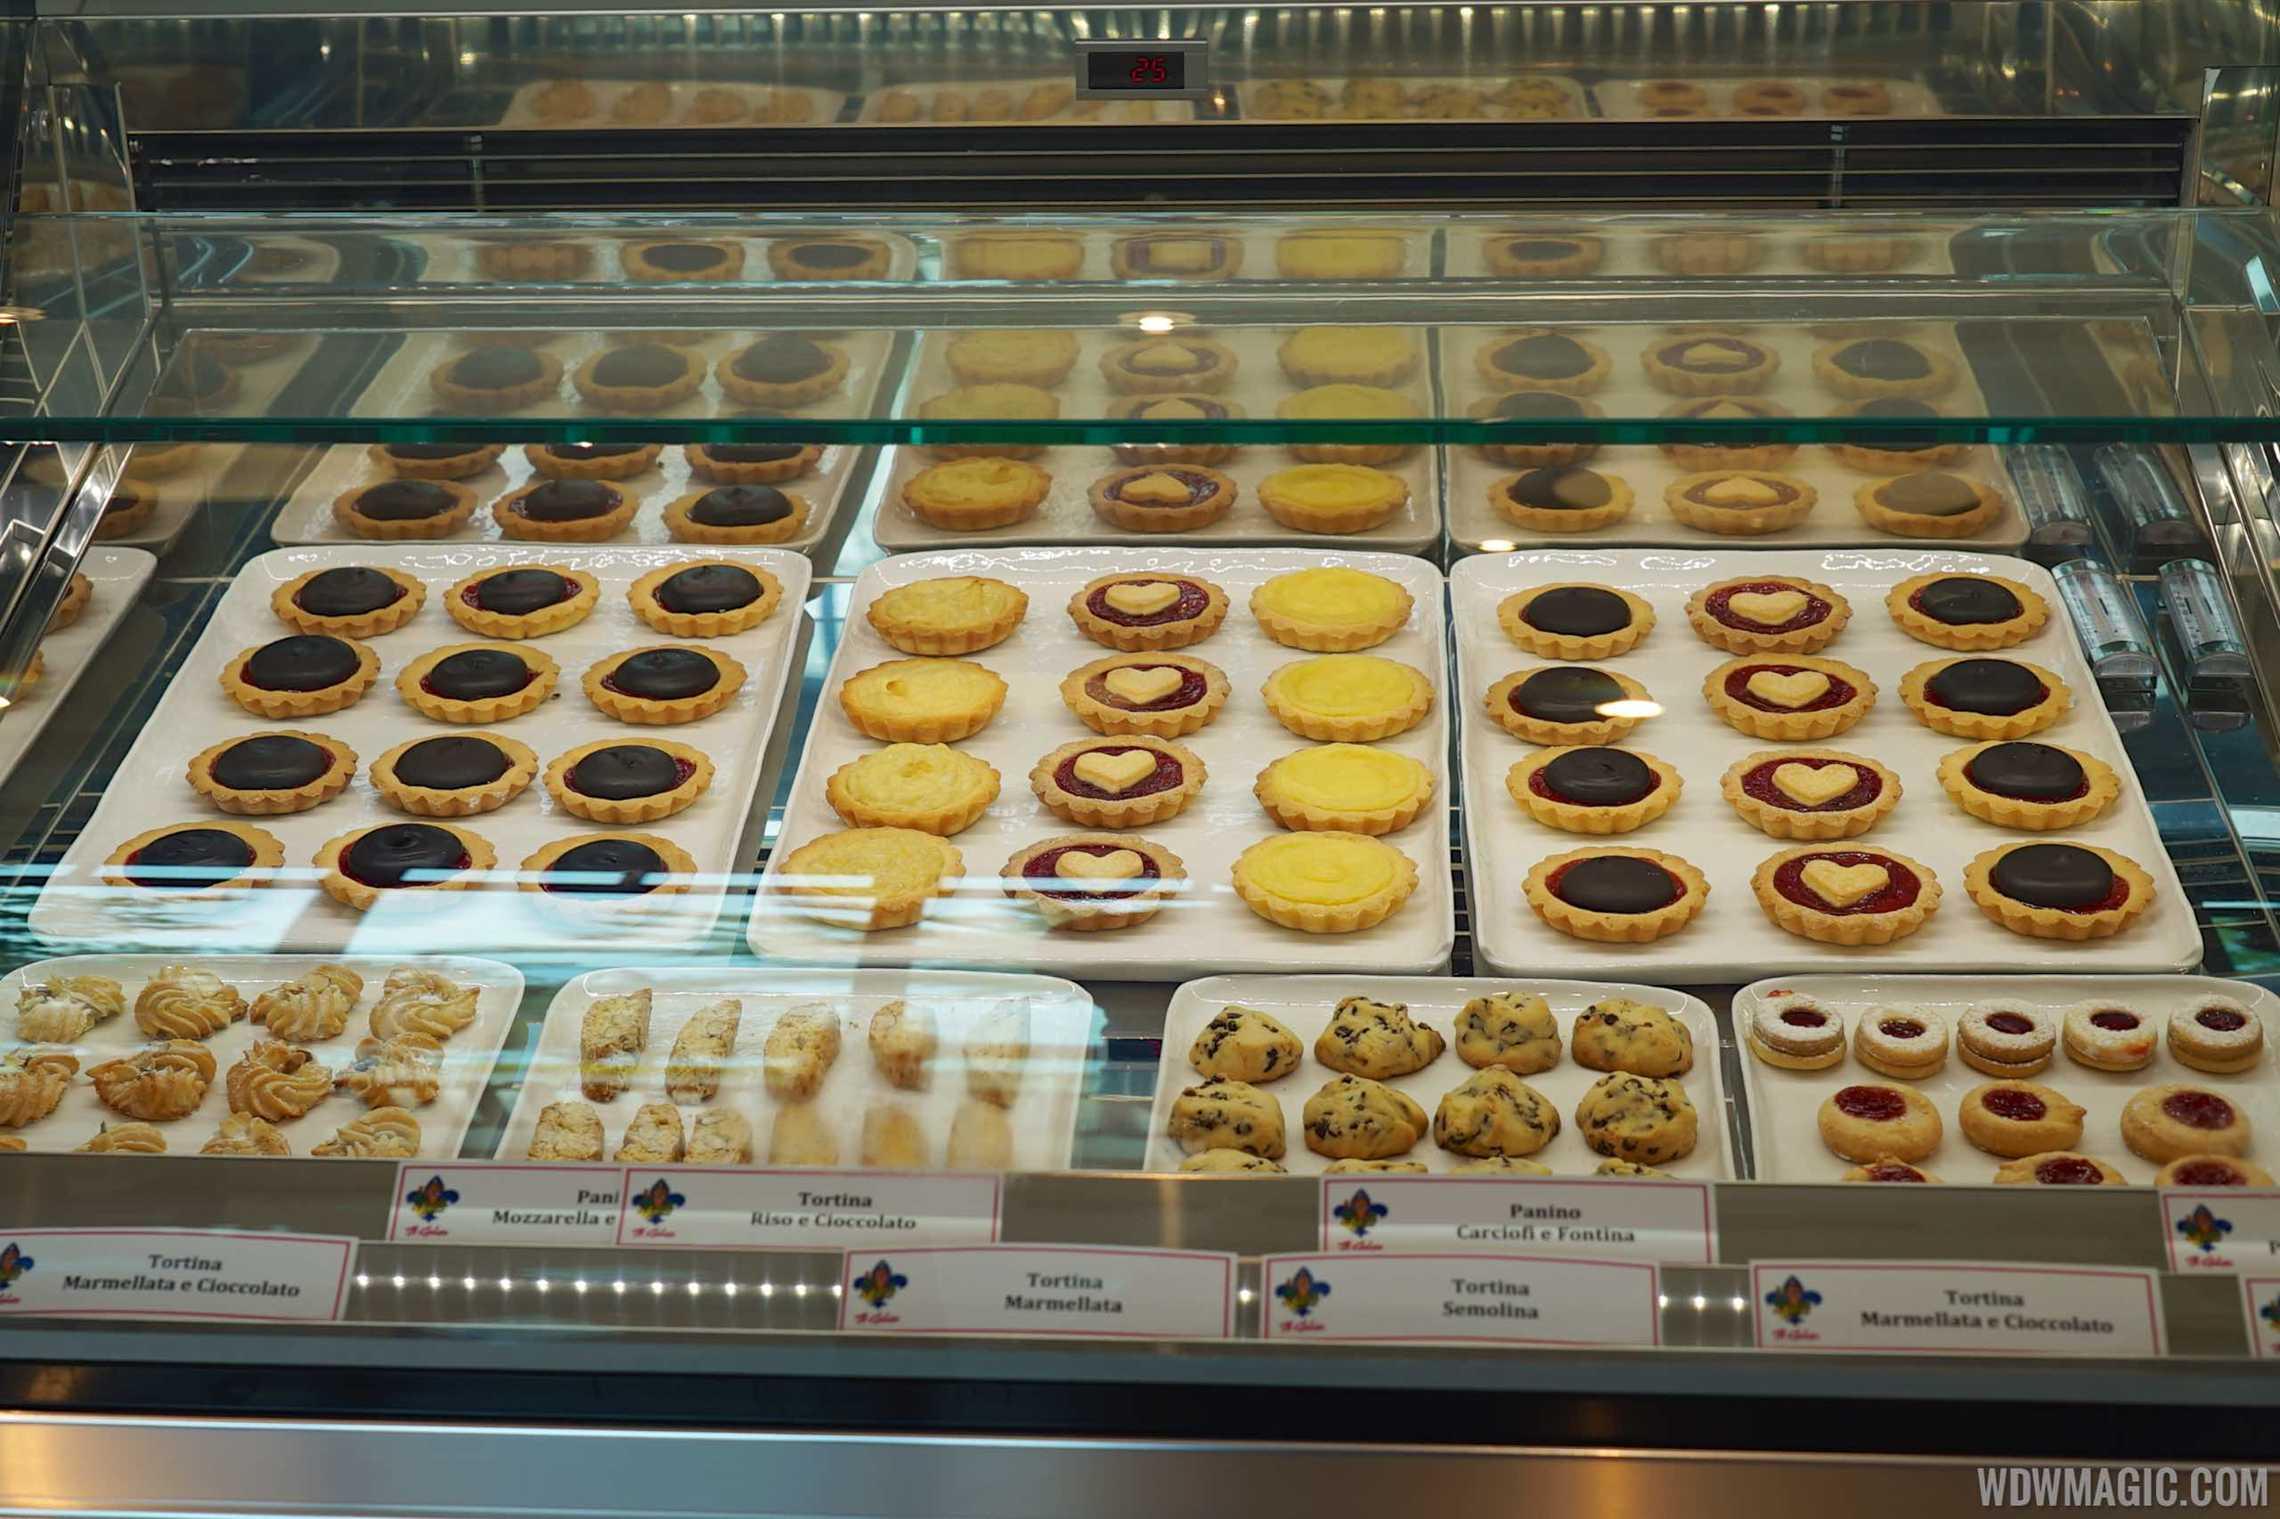 Vivoli Gelateria - Baked goods display